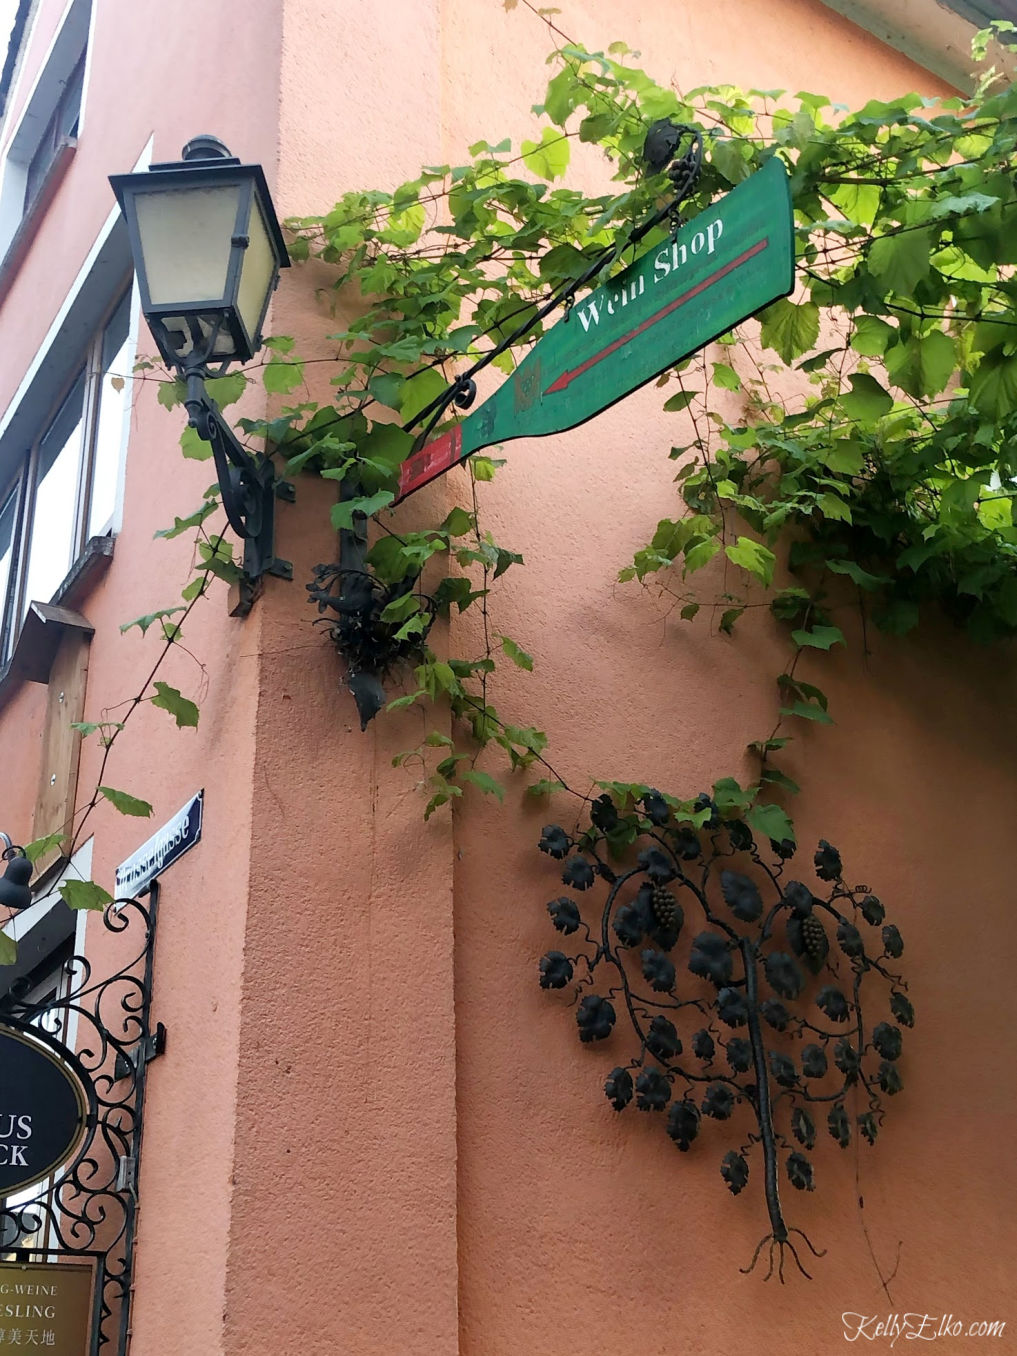 Charming little wein shop in Rudesheim Germany kellyelko.com #germany #rudesheim #travel #travelblog #travelblogger #cruise #myvikingstory #wineshop #vacation